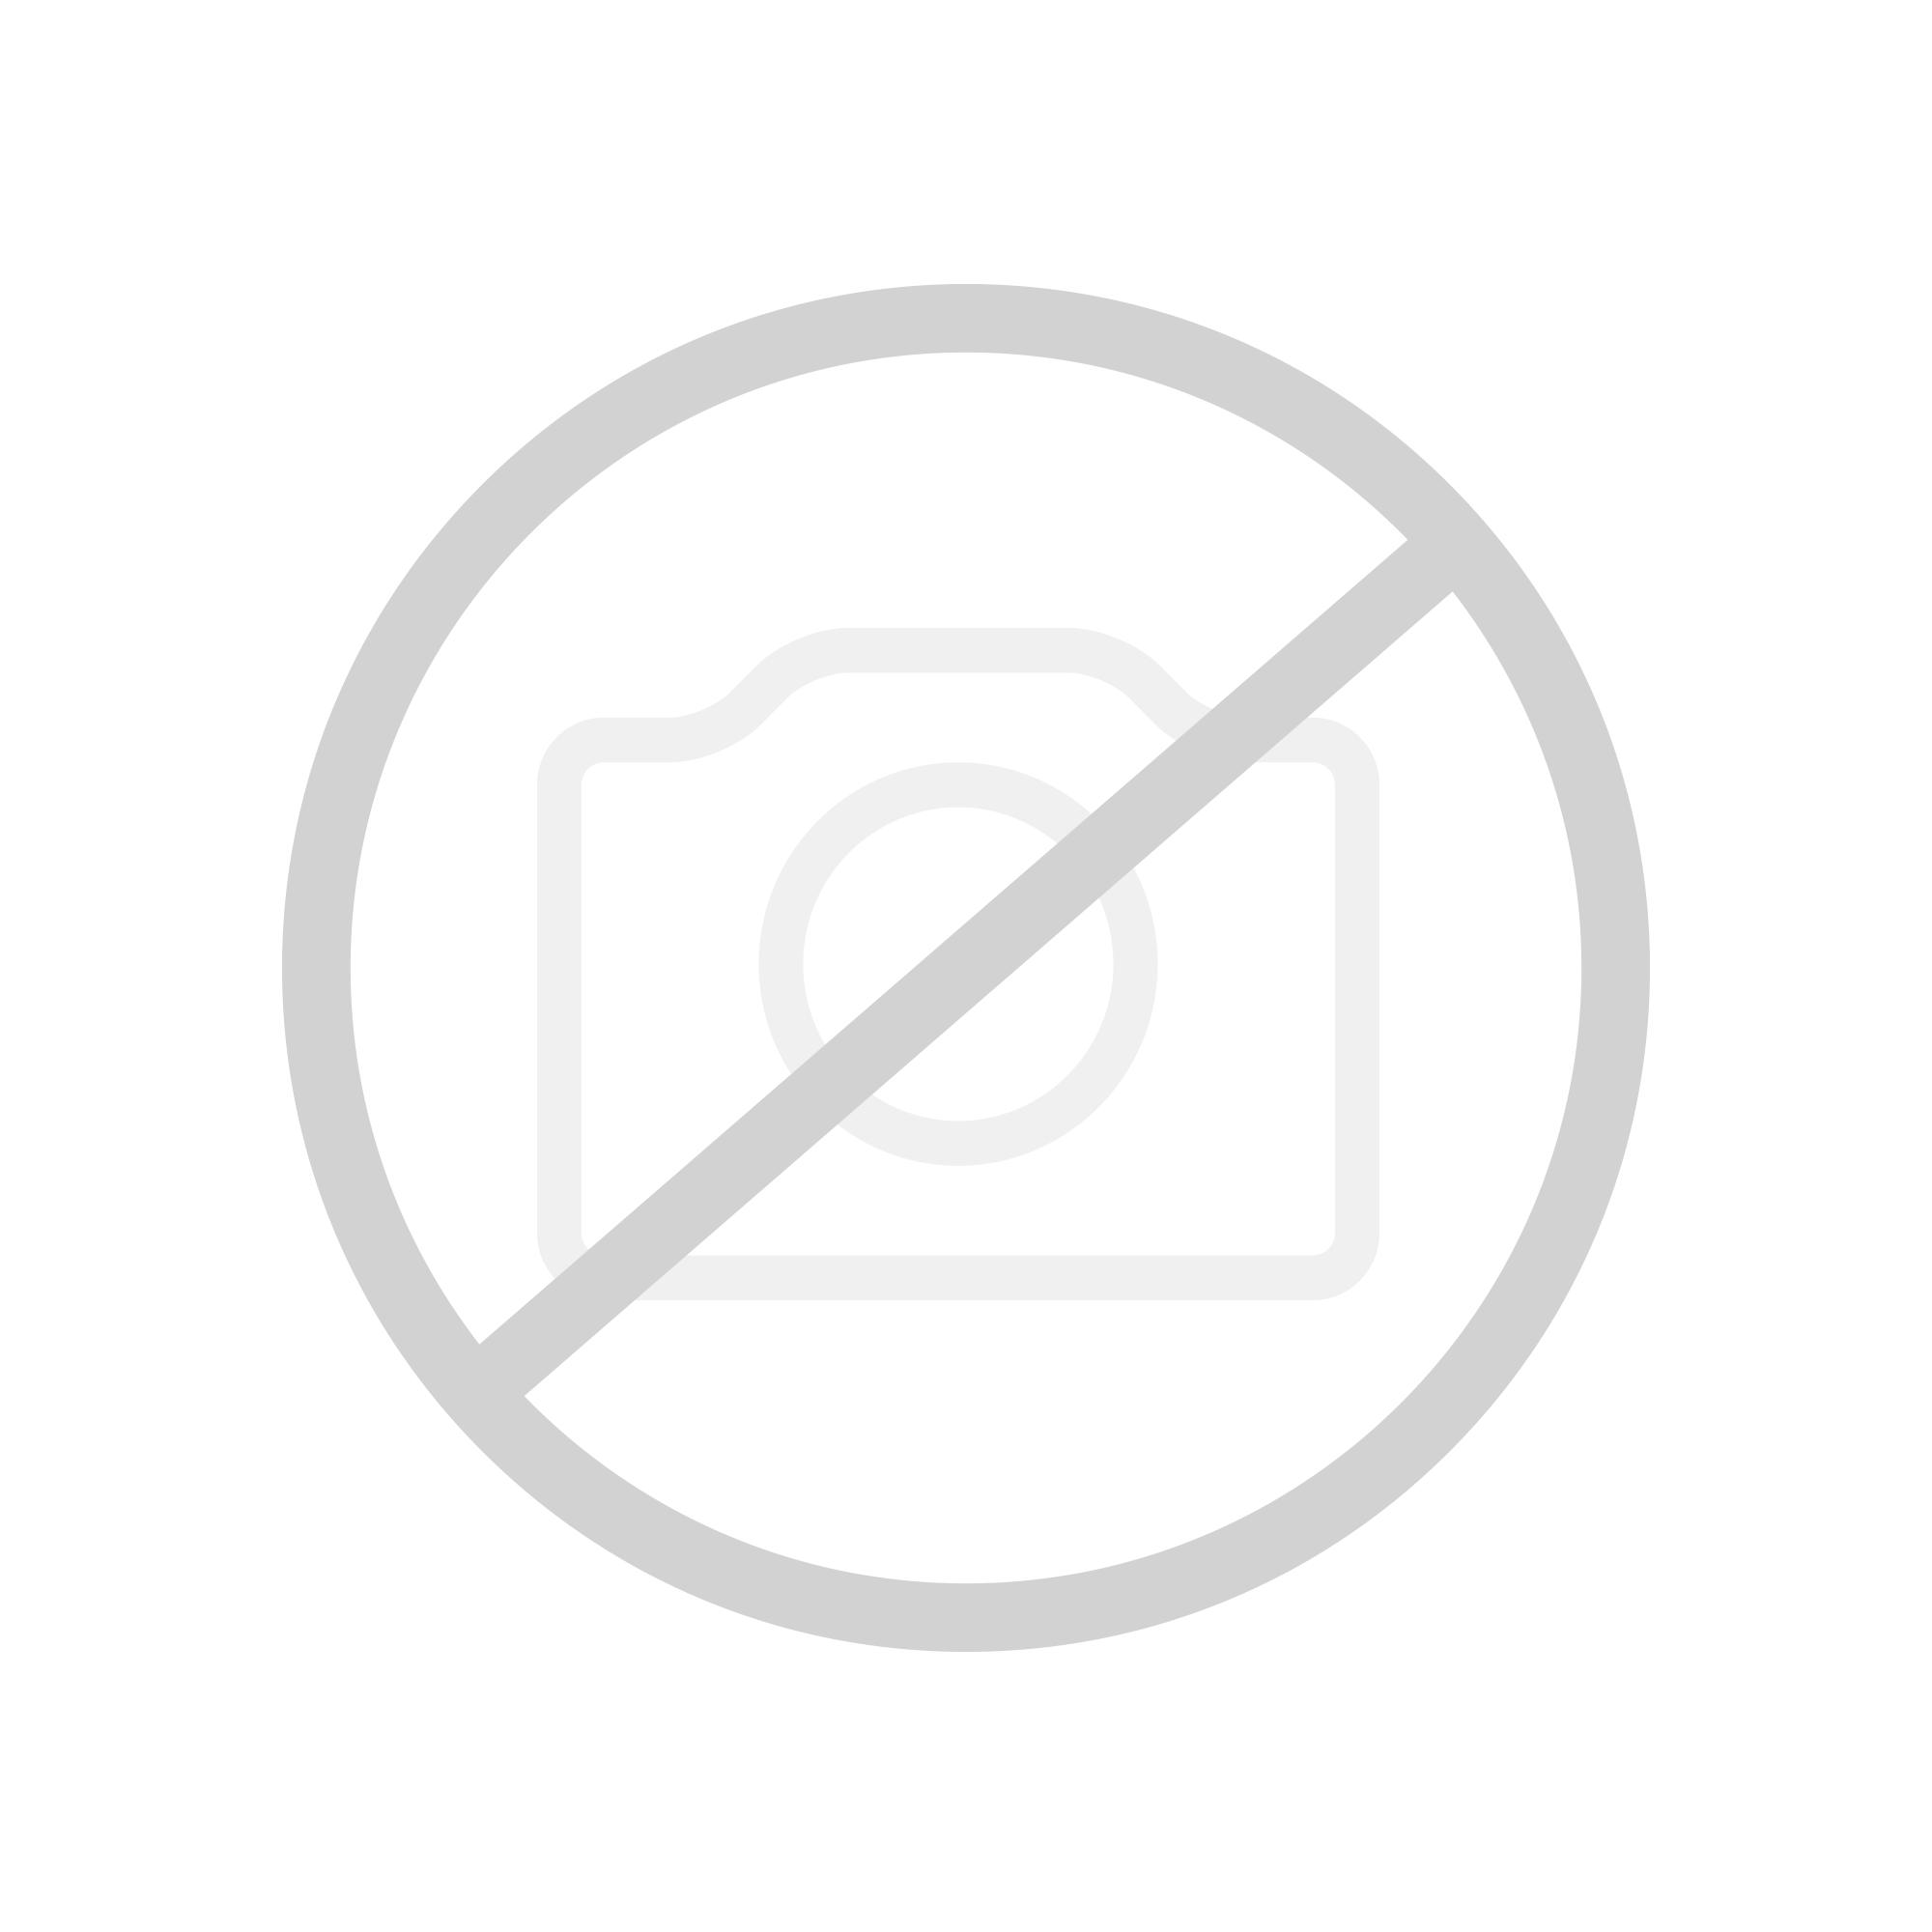 laufen pro wand tiefsp l wc compact l 49 b 36 cm sp lrandlos wei 8209650000001 reuter. Black Bedroom Furniture Sets. Home Design Ideas